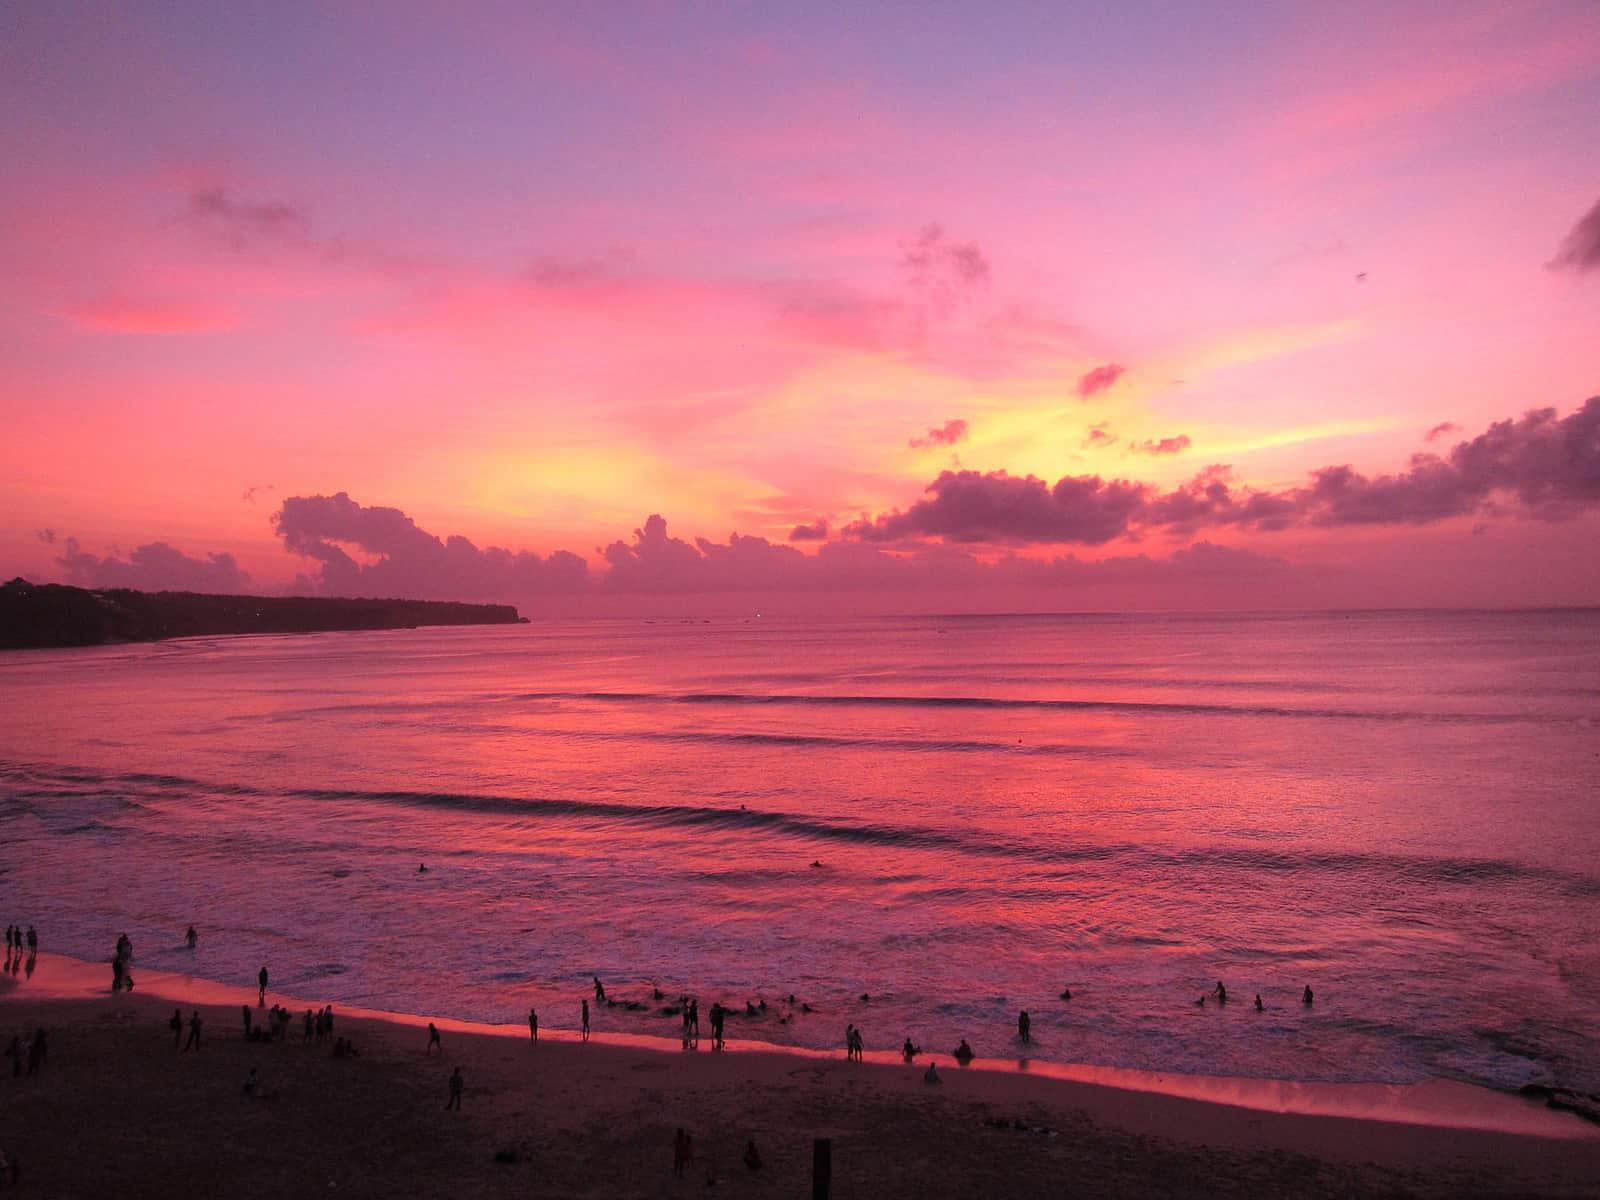 Playa Dreamland en Bali, Indonesia. Atardecer